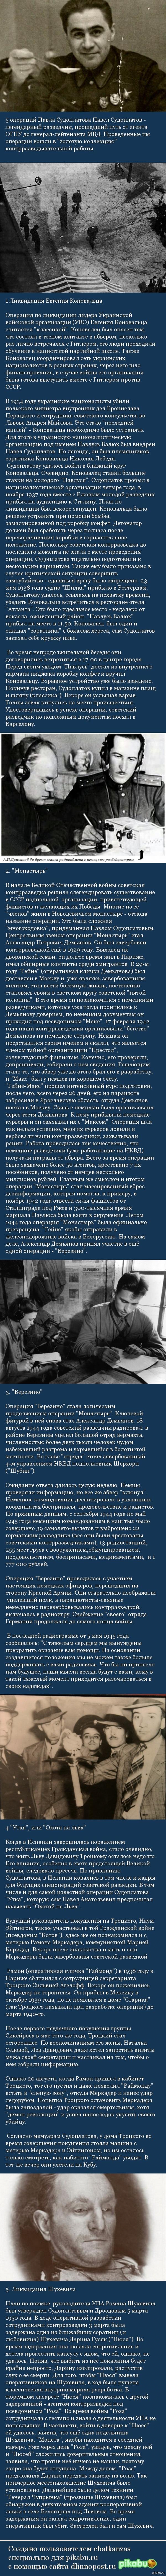 5 операций Павла Судоплатова